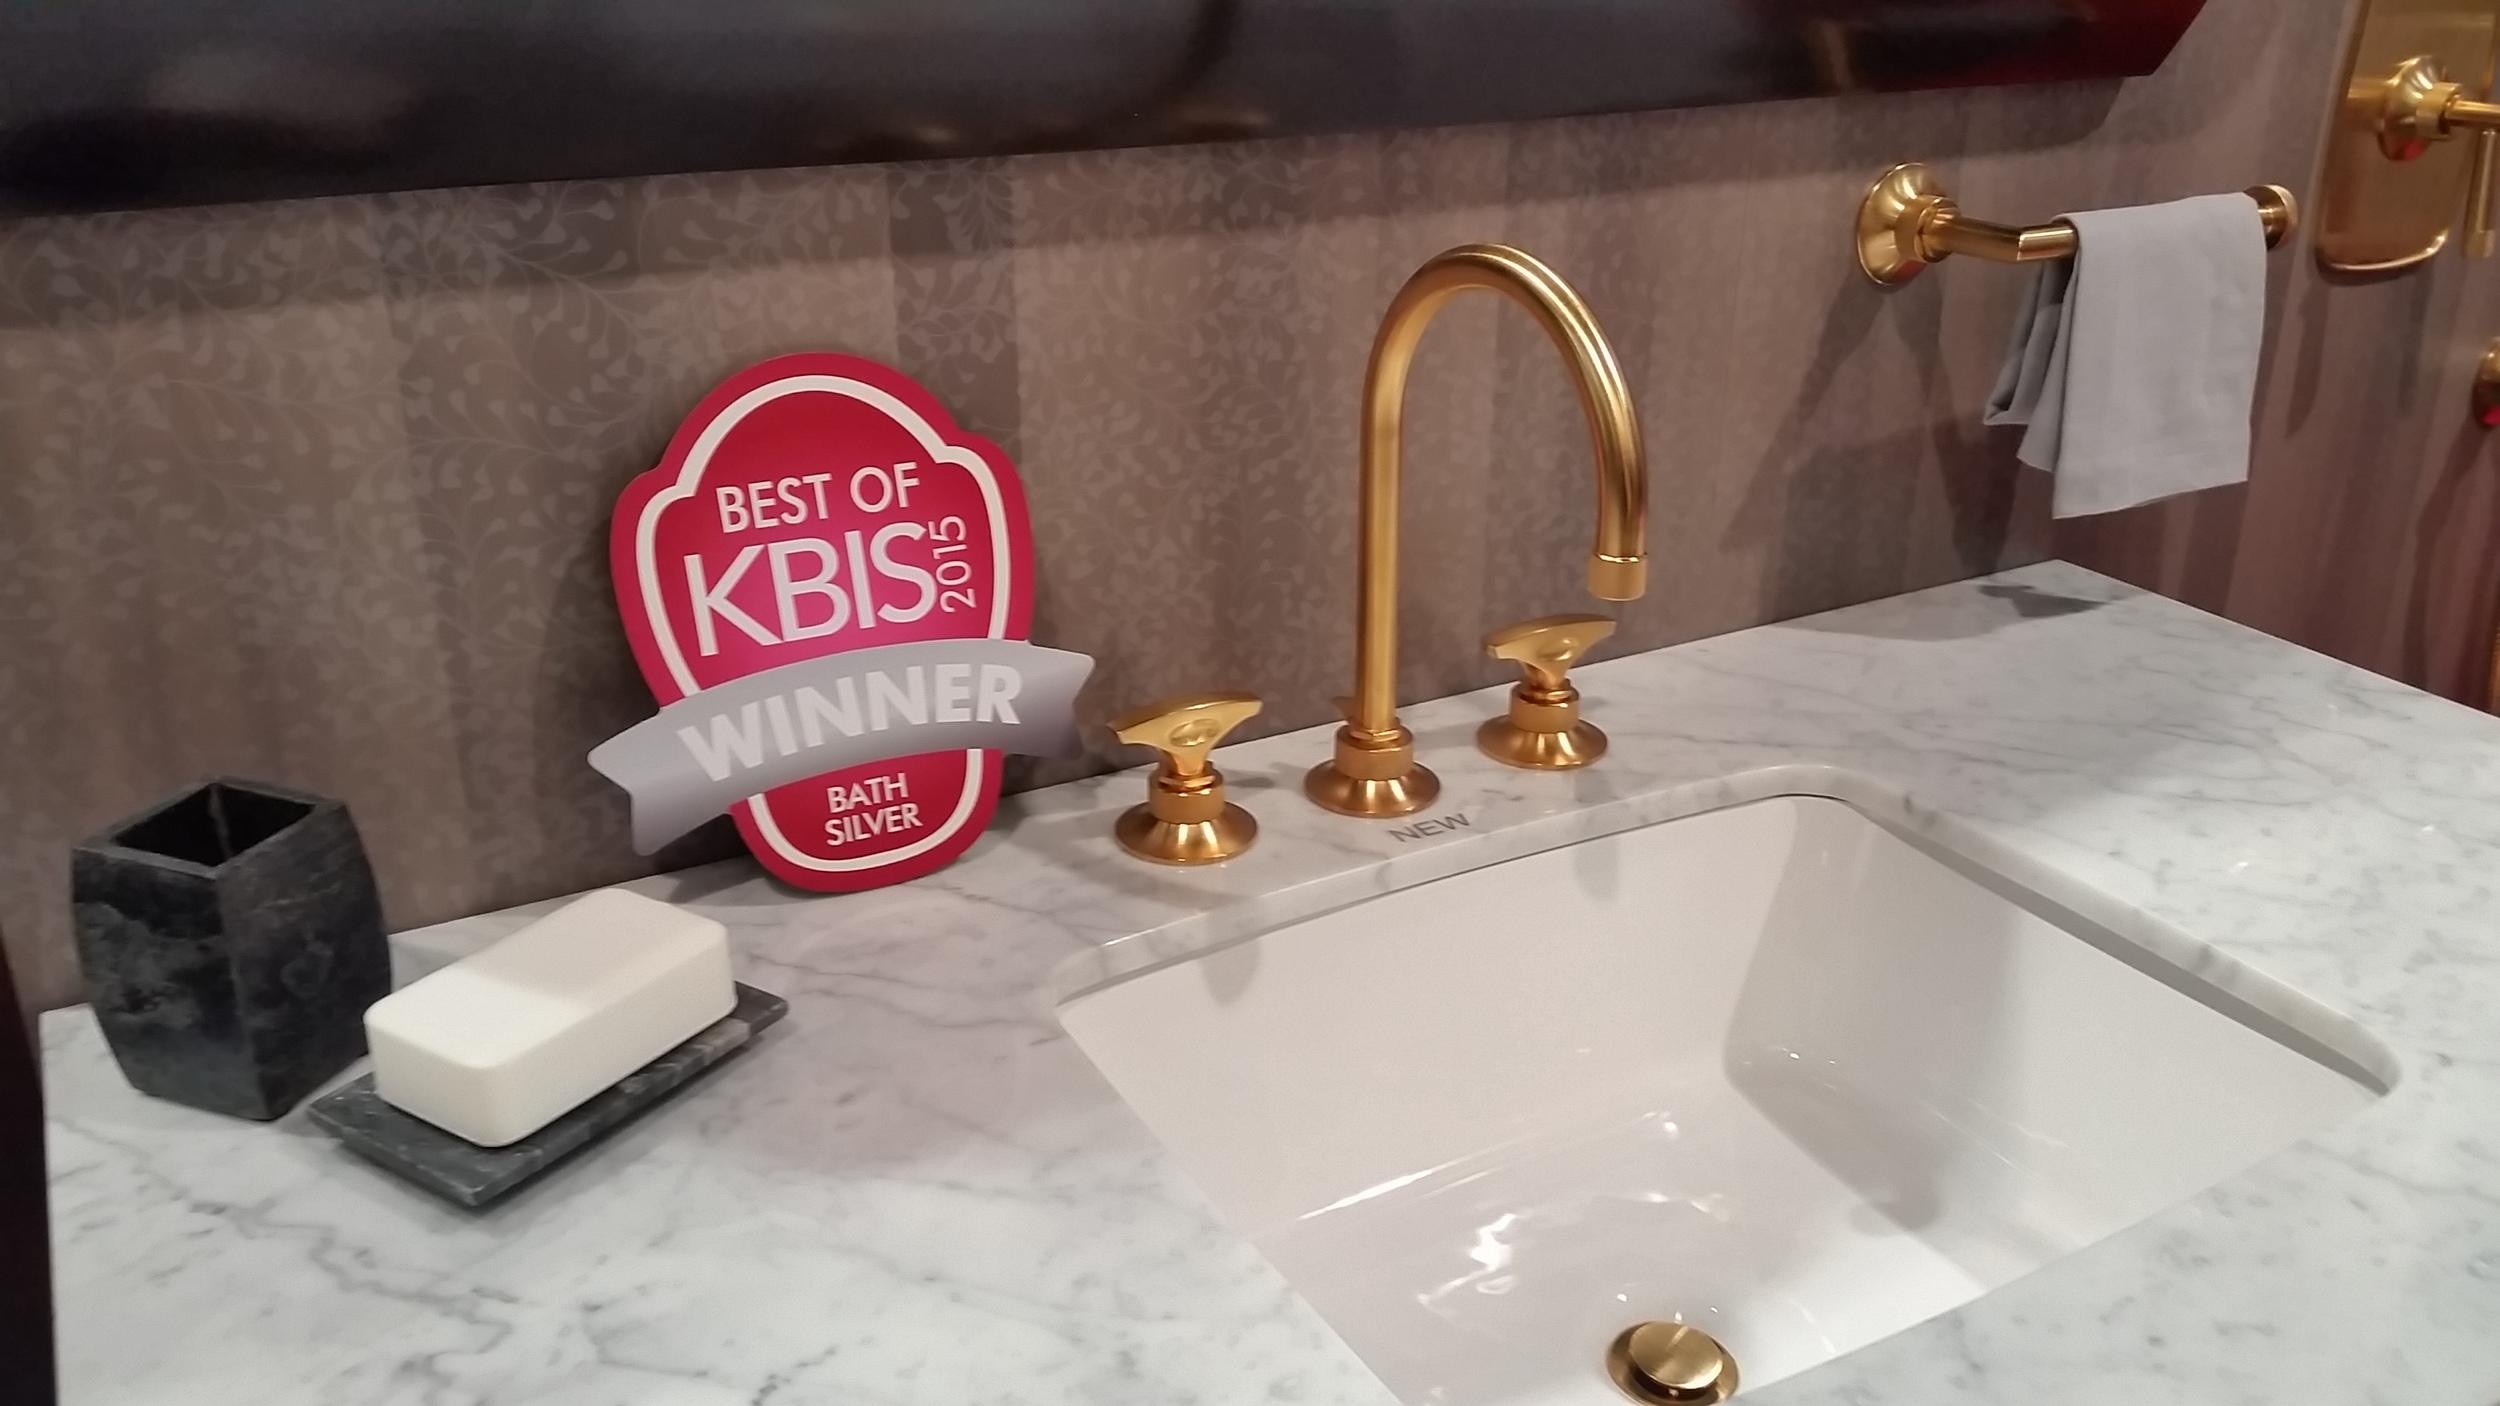 ROHL_KBIS 2015_Best of KBIS Bath Silver Award.jpg